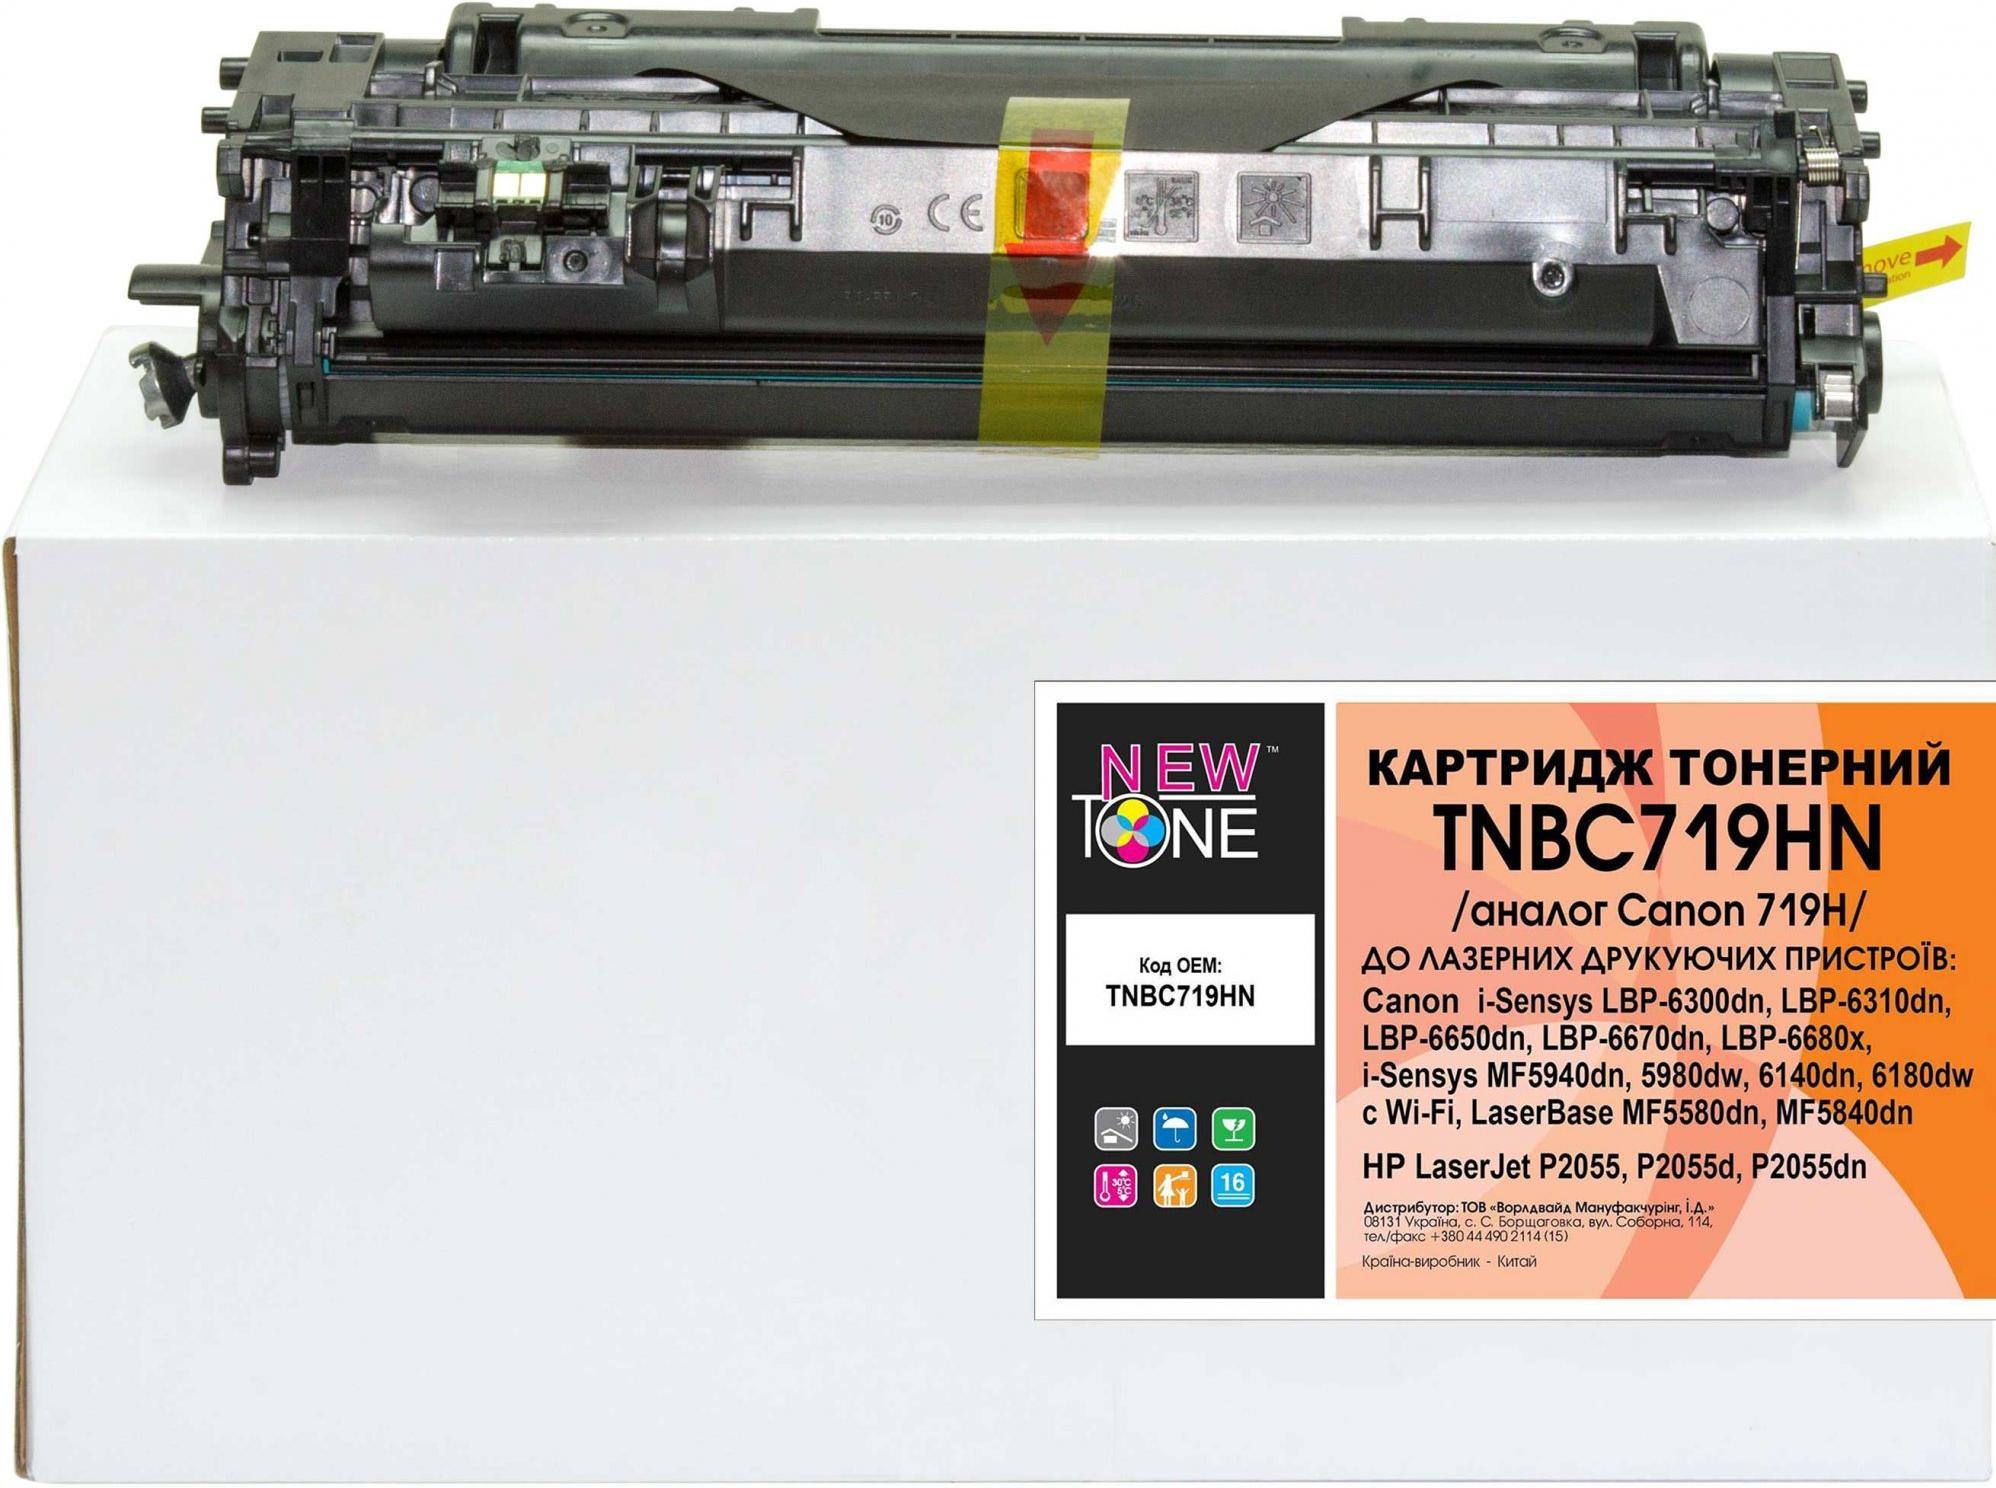 Купить Картридж NewTone for Canon MF5840, LBP-6300 аналог Canon 719H Black (TNBC719HN)